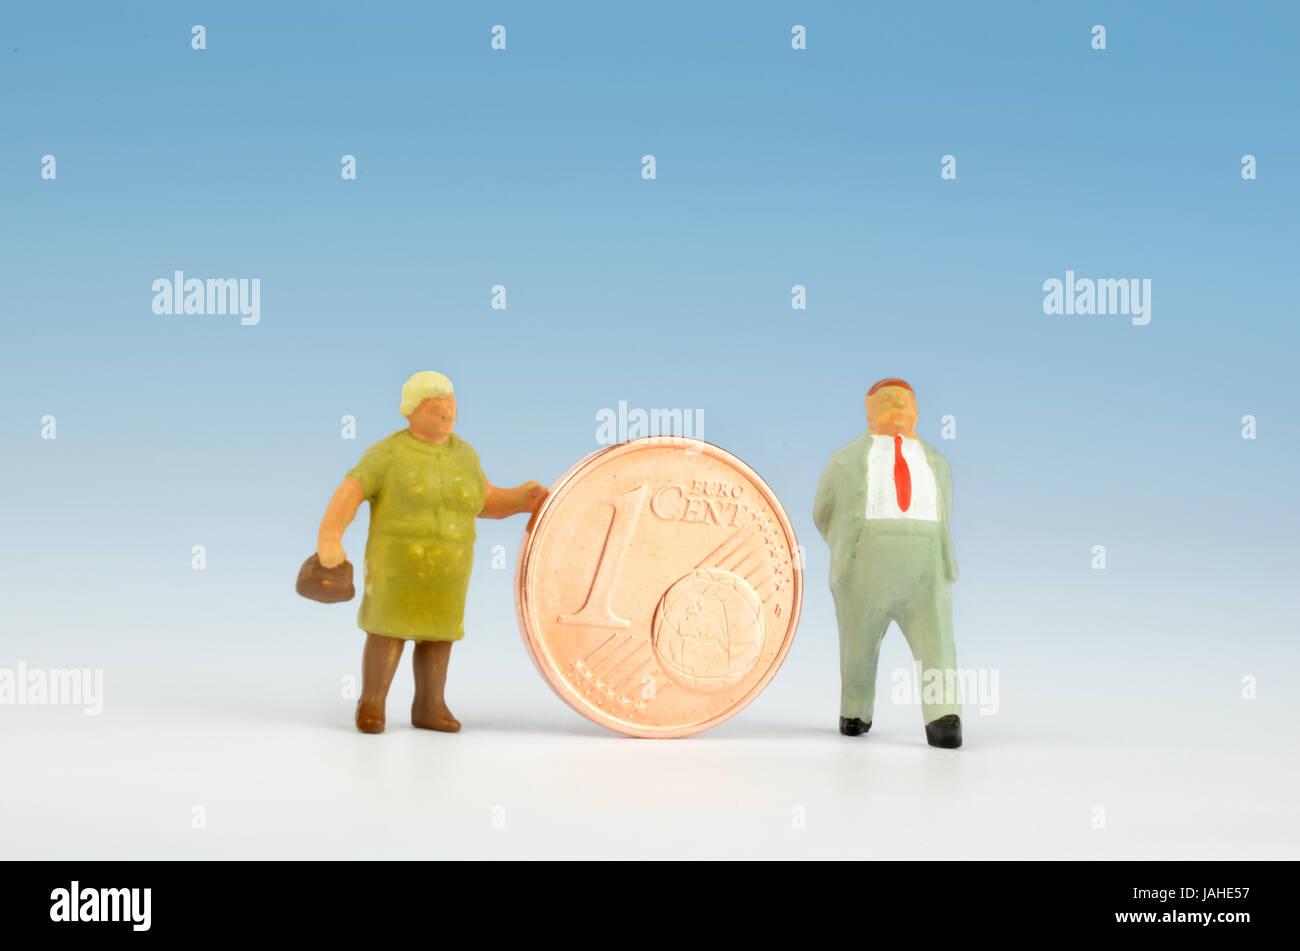 elder person older person - Stock Image